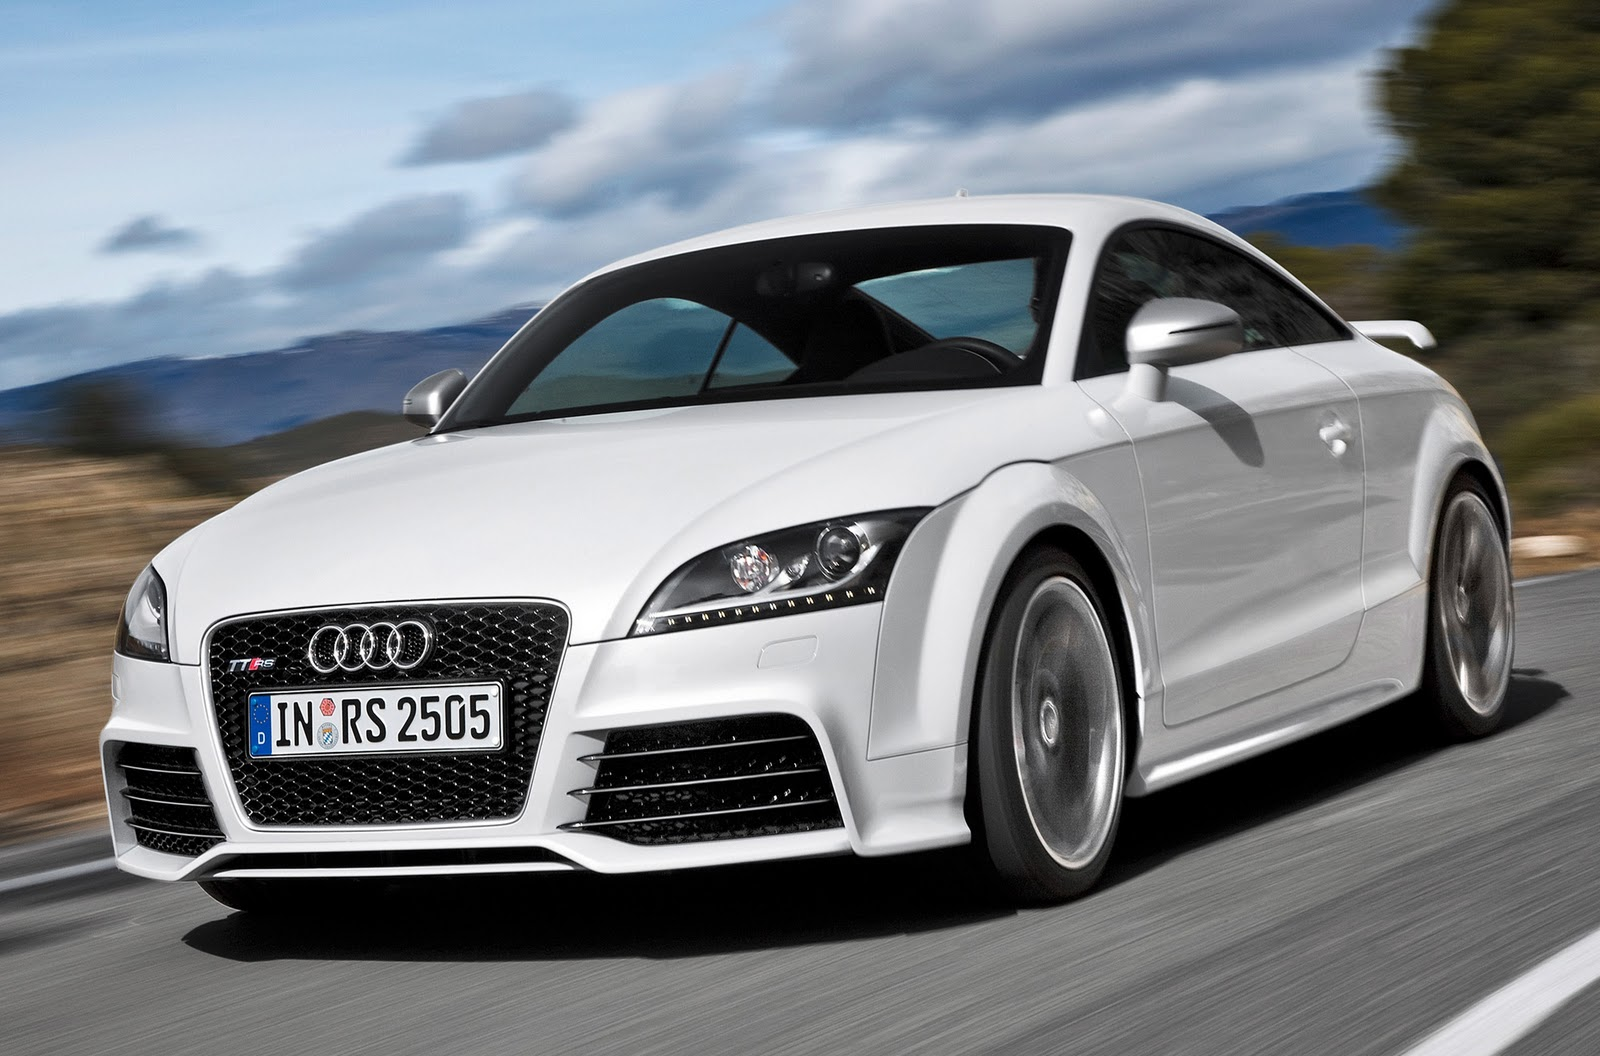 Audi Tt Rs Fast White Car Wallpaper 226 Car Wallpaper